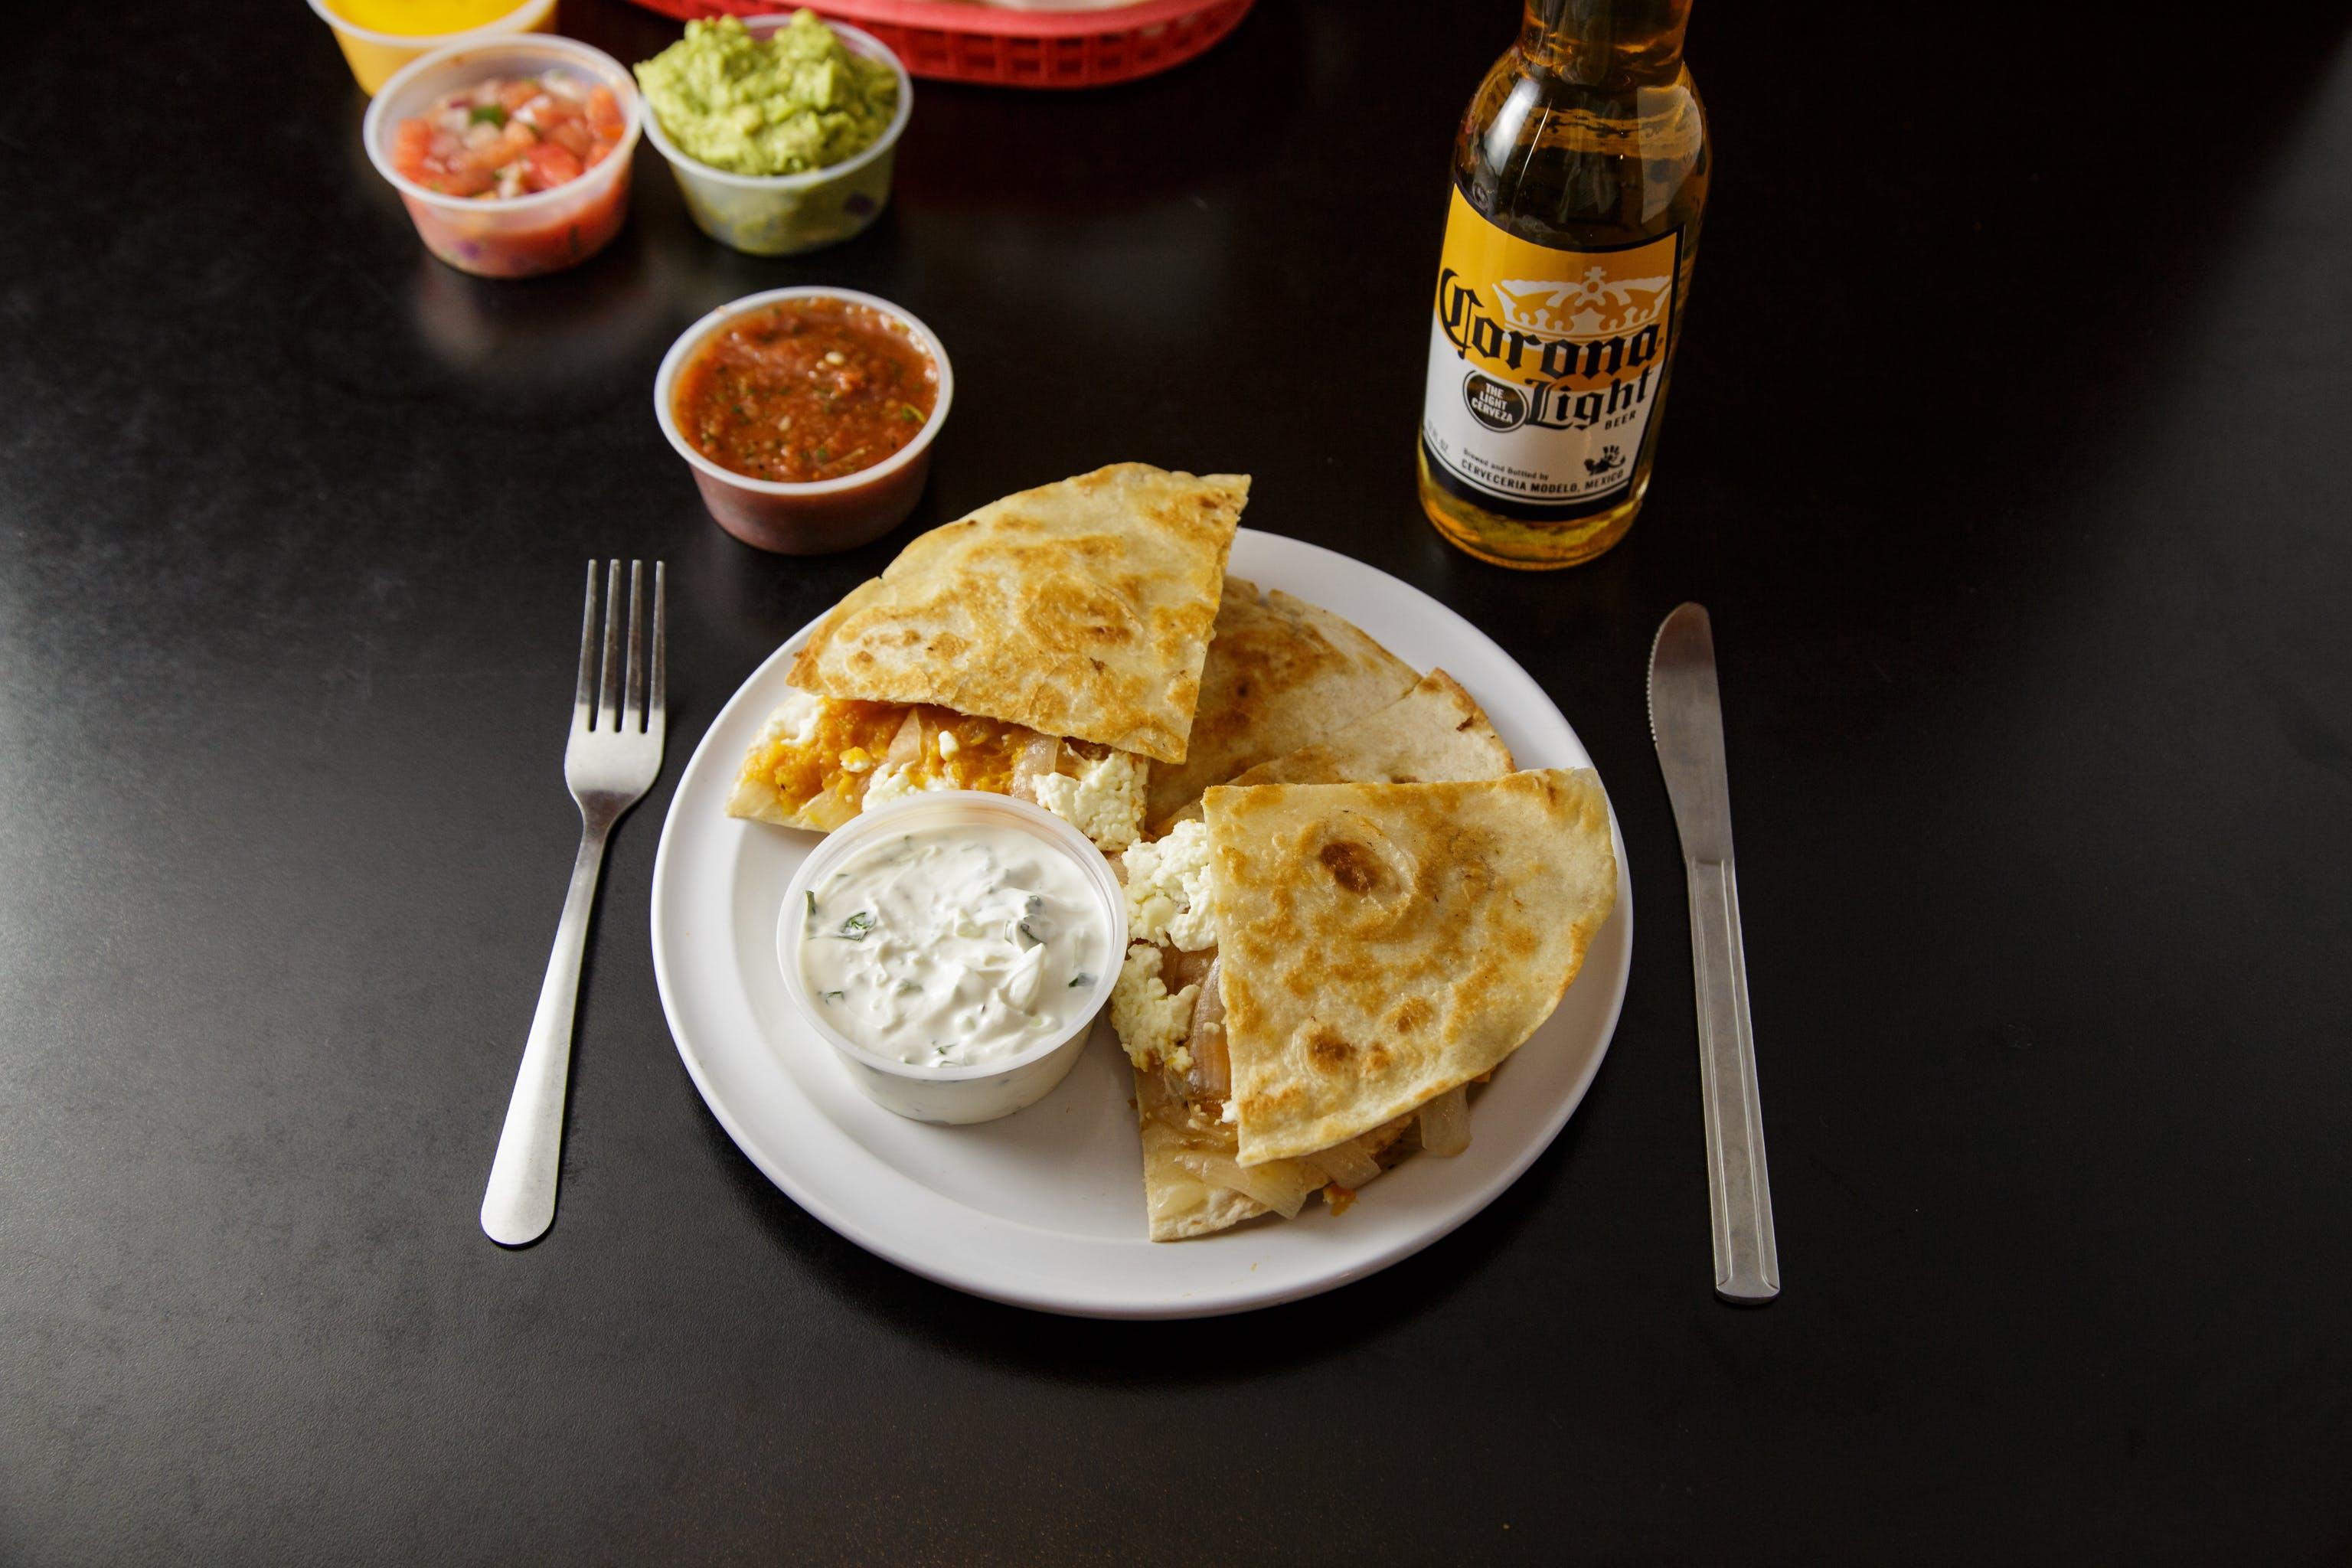 The BD Quesadilla from Burrito Drive in Madison, WI